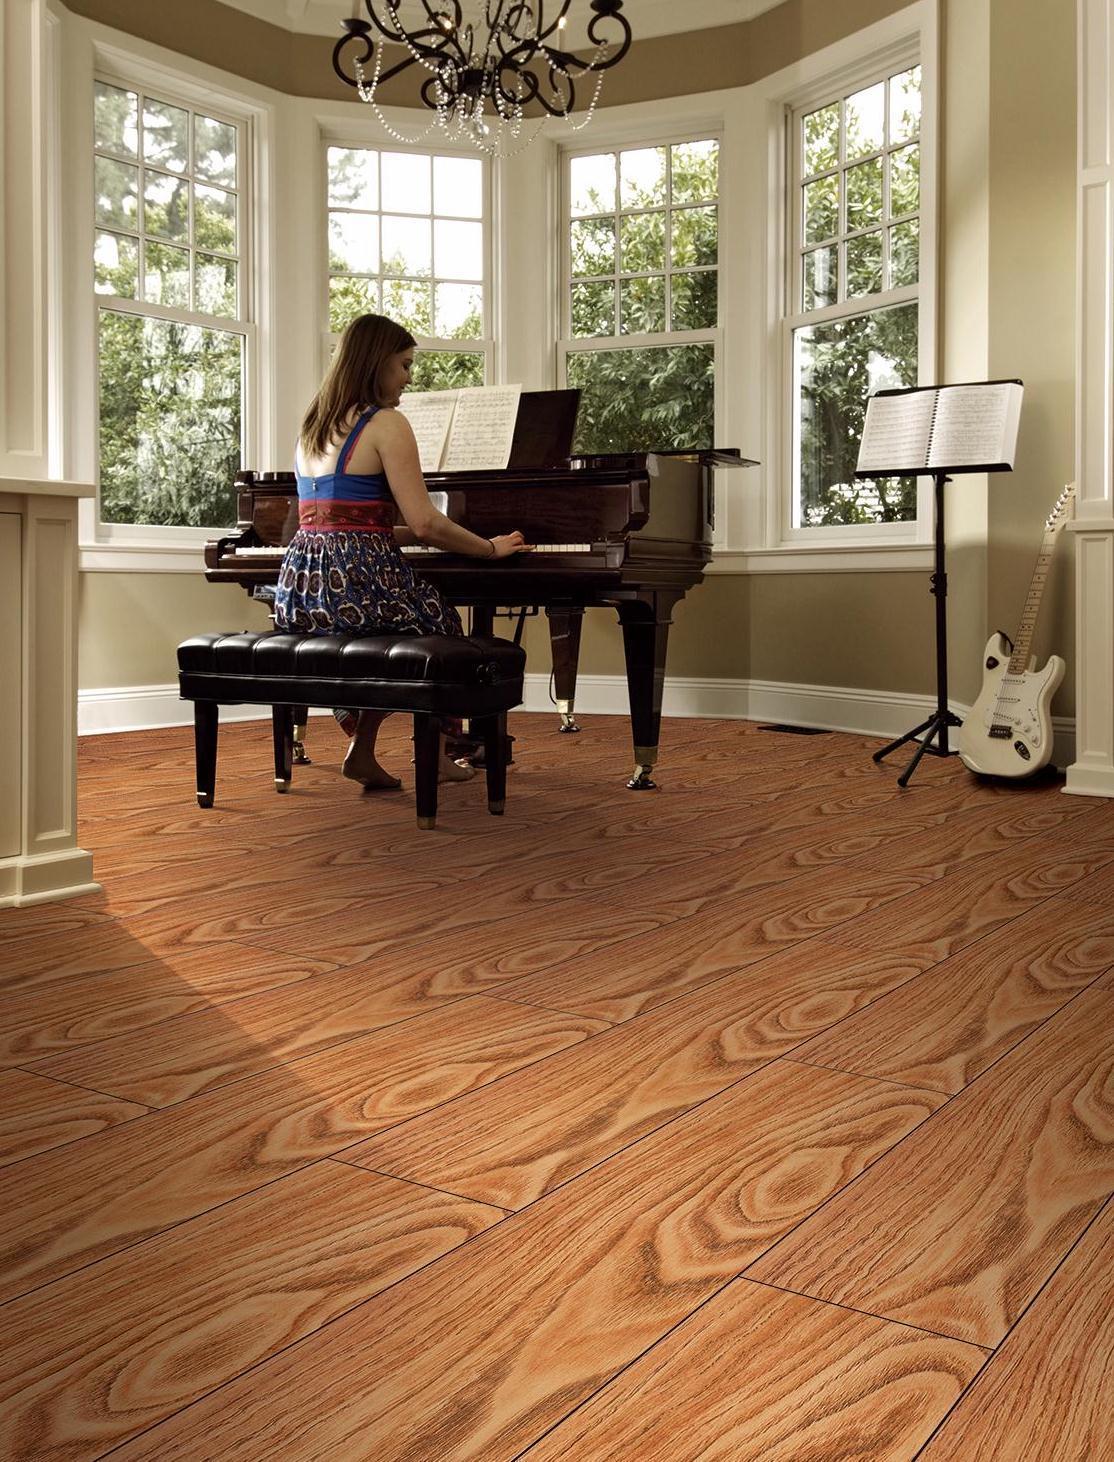 Floor tile supplier choice image tile flooring design ideas ceramic floor tile suppliers images tile flooring design ideas ceramic tile supplier images tile flooring design dailygadgetfo Gallery